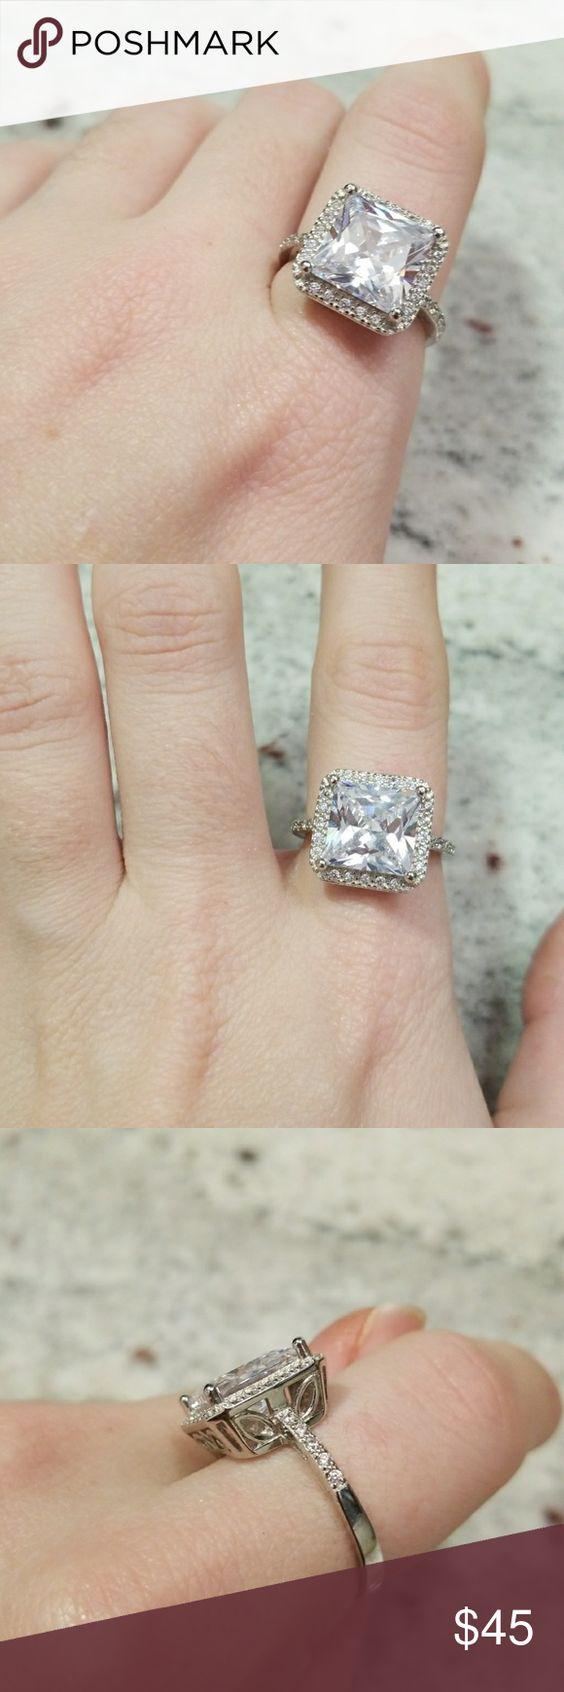 1 1 Stunning Stone Ring Fashion Design Jewelry Fashion Tips